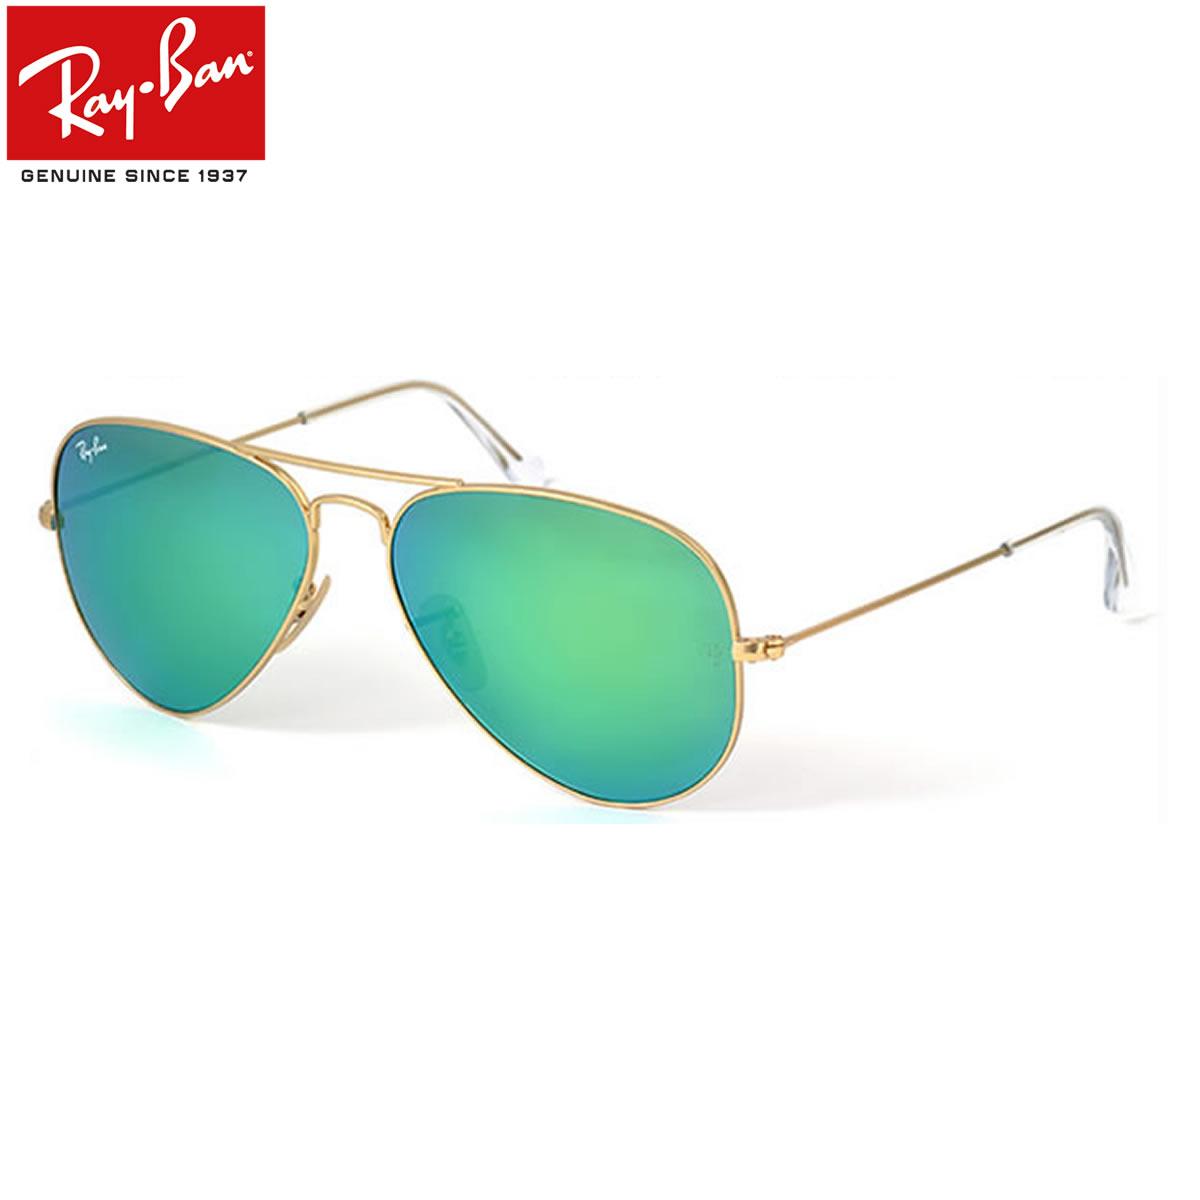 【Ray-Ban】(レイバン) アビエーター クラシックメタル サングラス RB3025 …...:thats:10022507